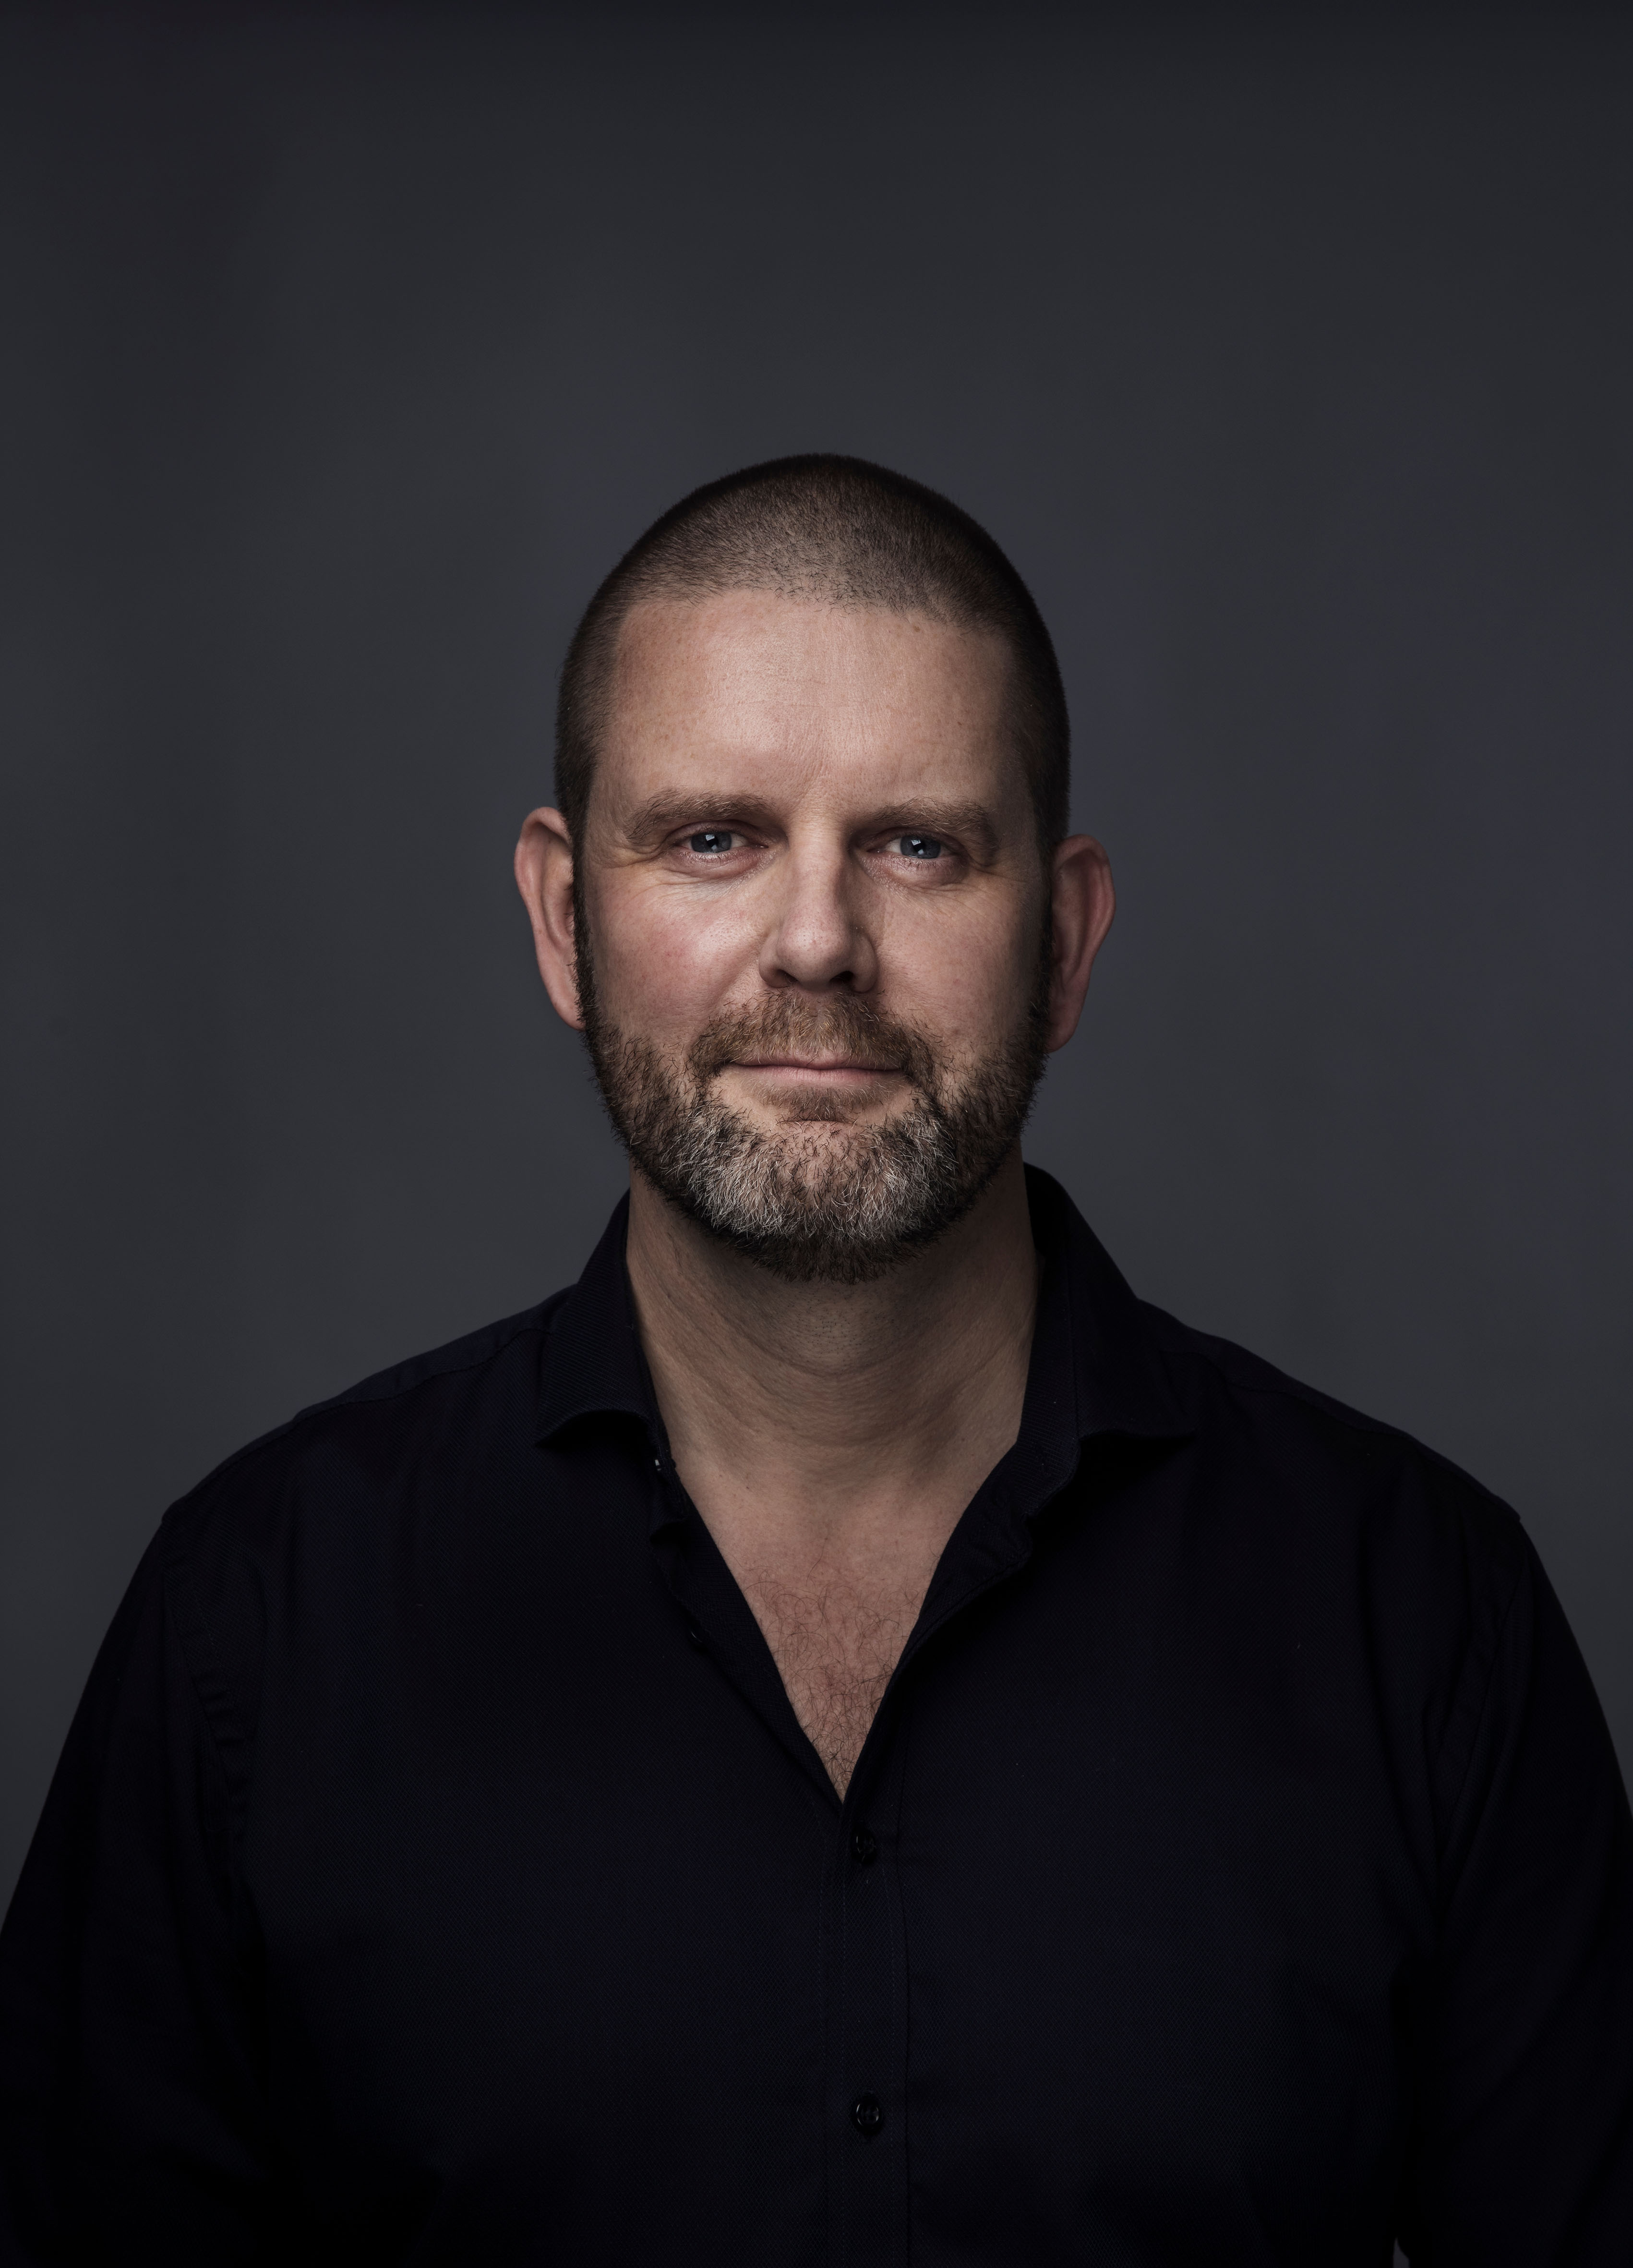 Professor Peter Teglberg Madsen